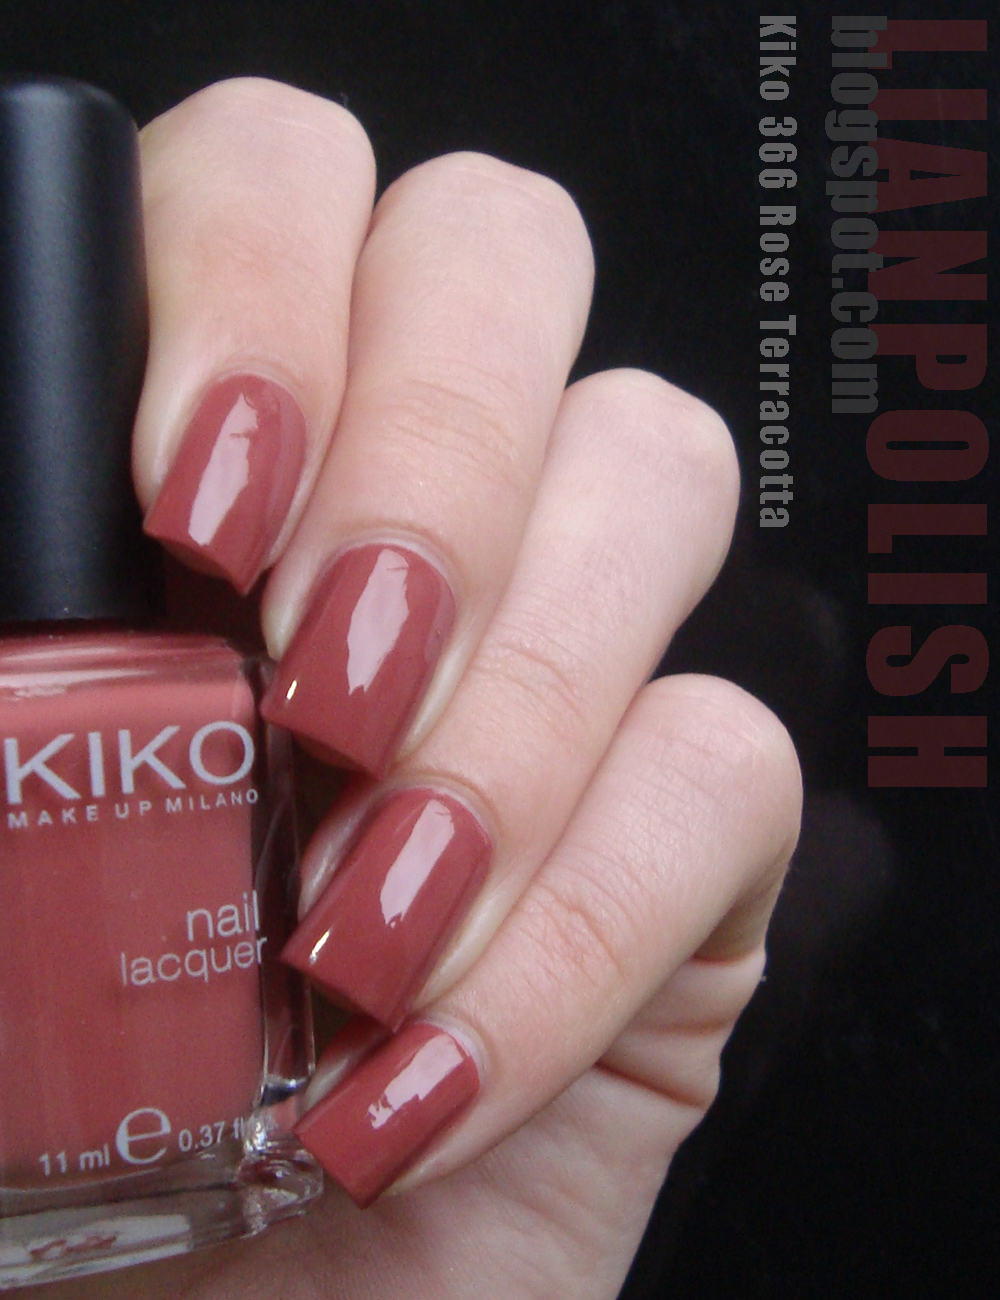 Kiko 366 Rose Terracotta